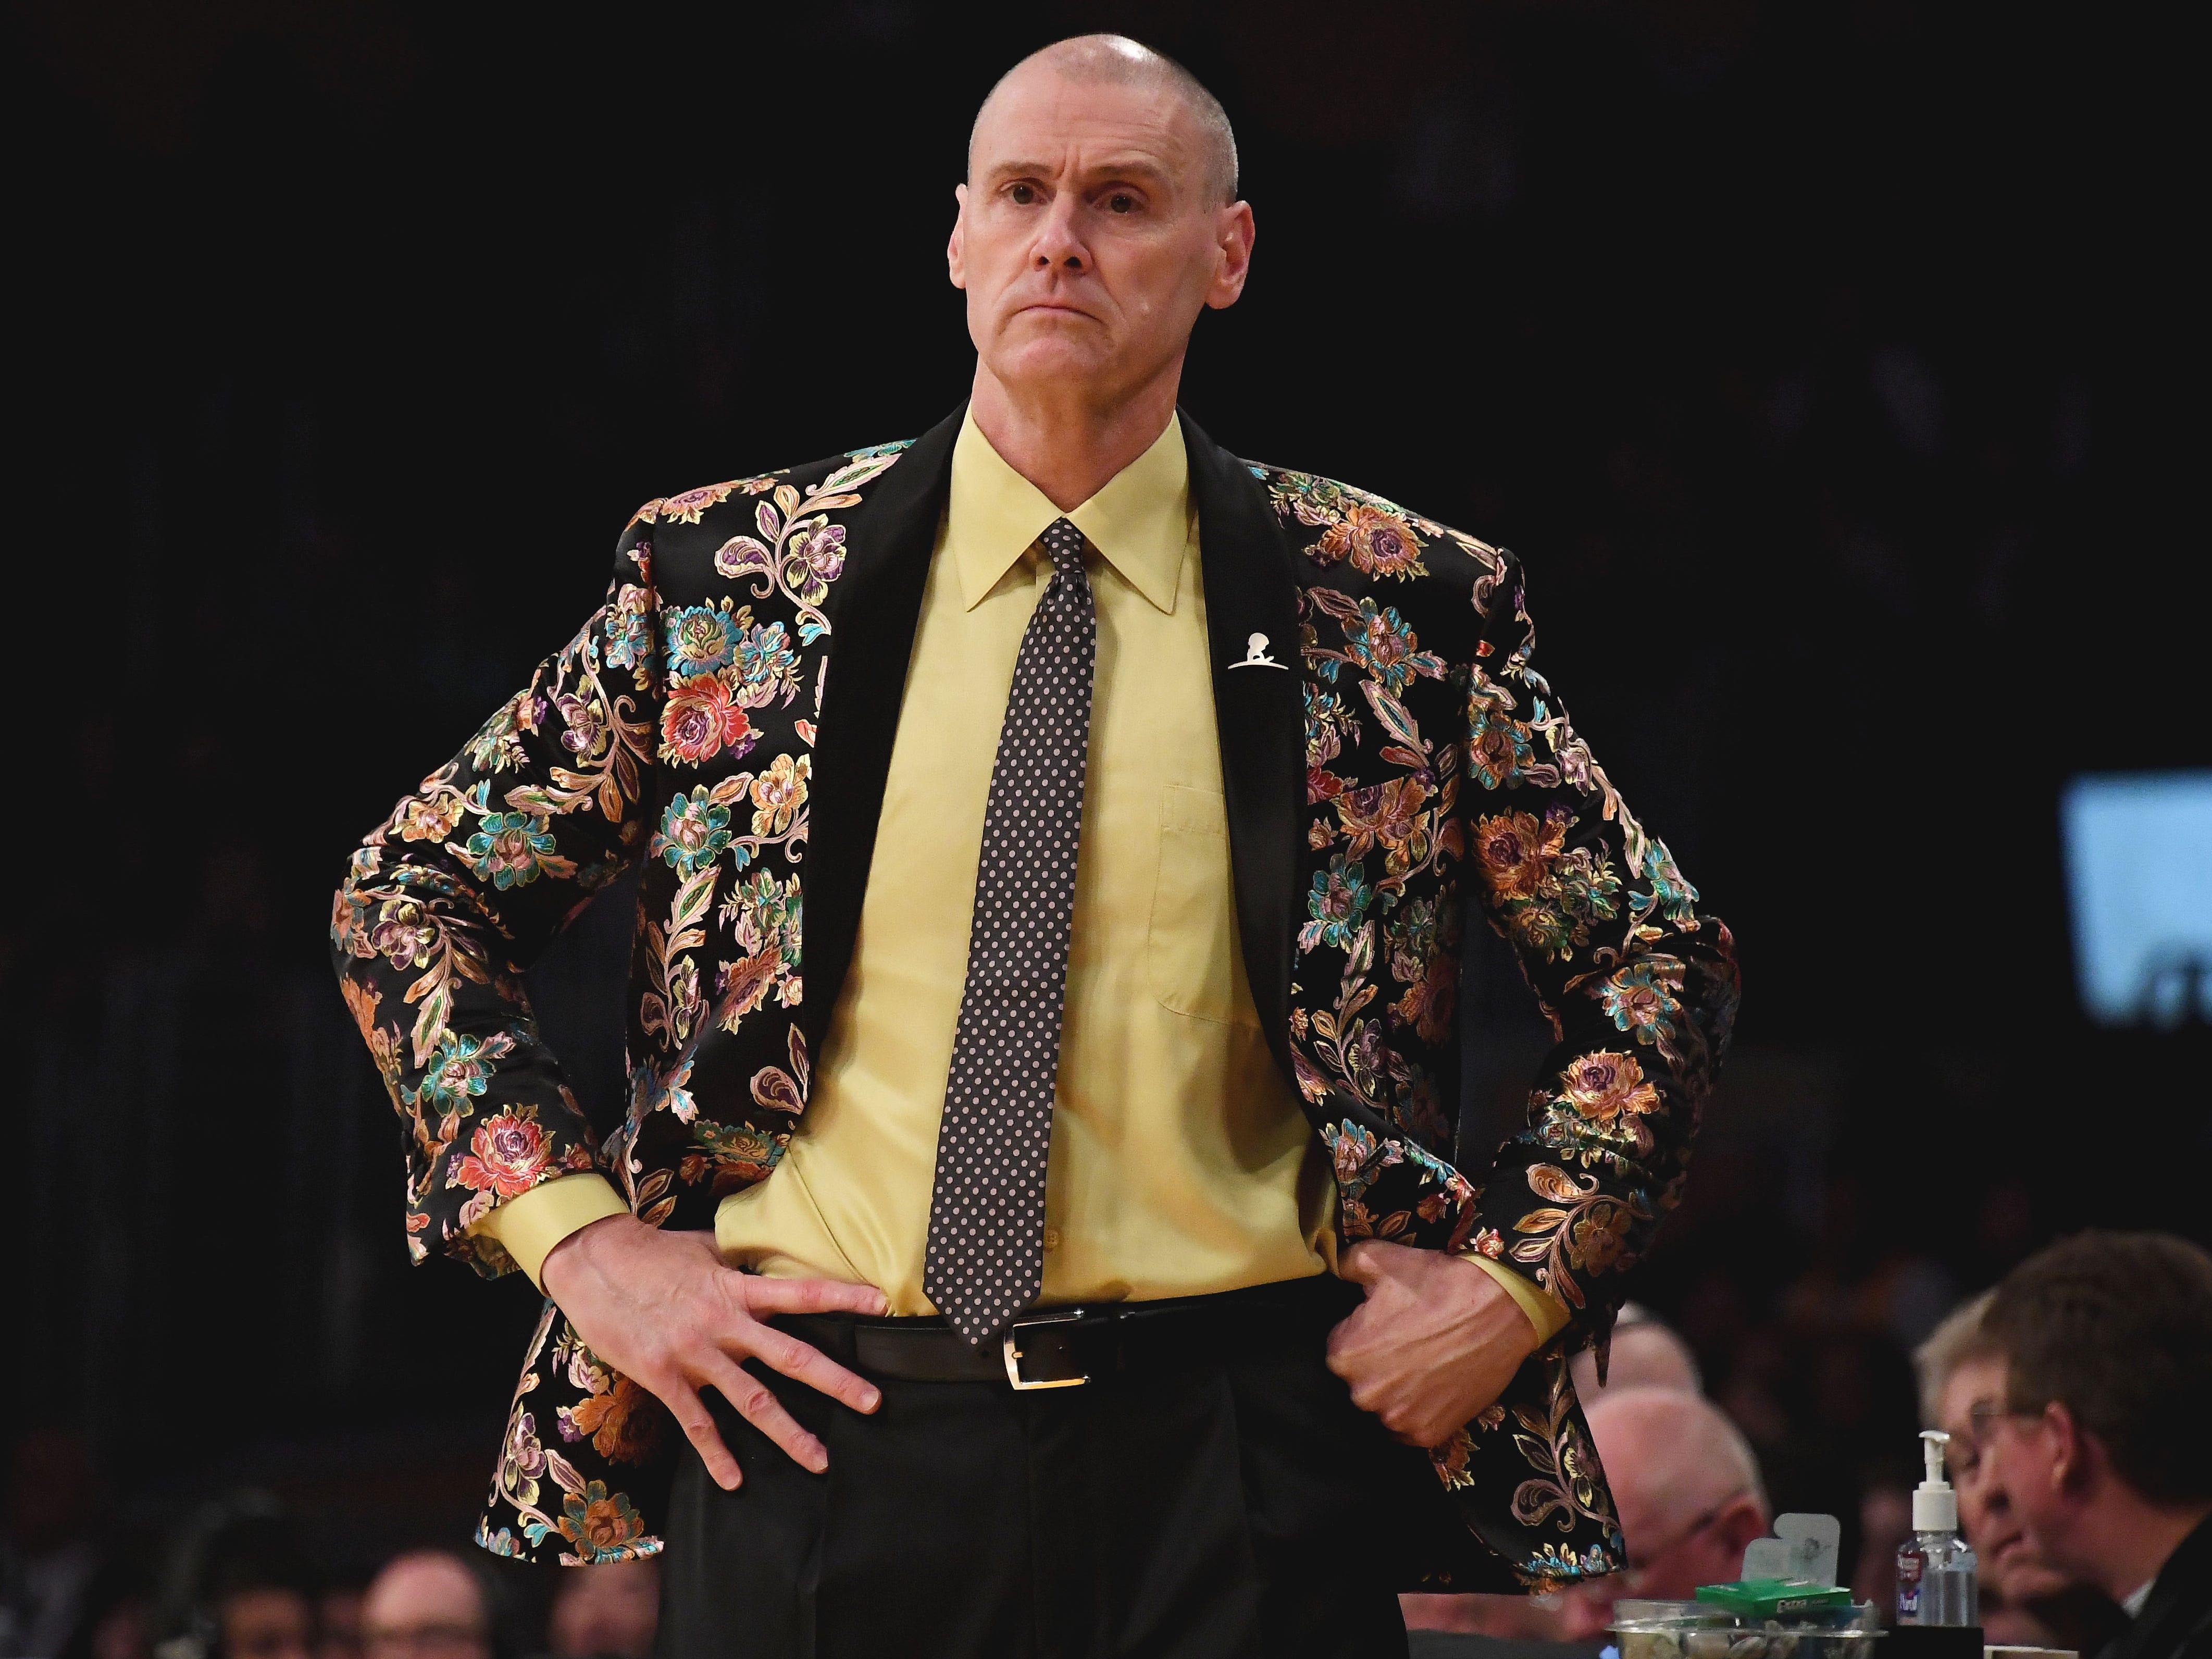 Nov. 30: Dallas Mavericks coach Rick Carlisle